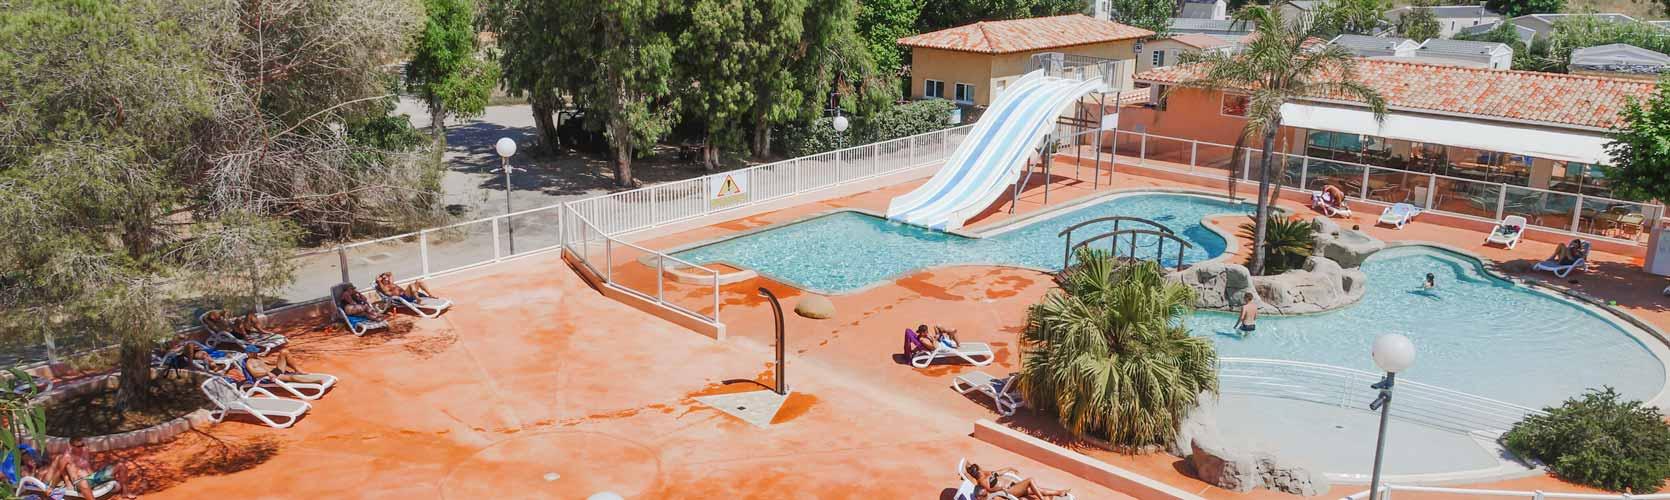 Corsica Campsite With Swimming Pool | Calvi Campsite With ... concernant Camping Var Avec Piscine